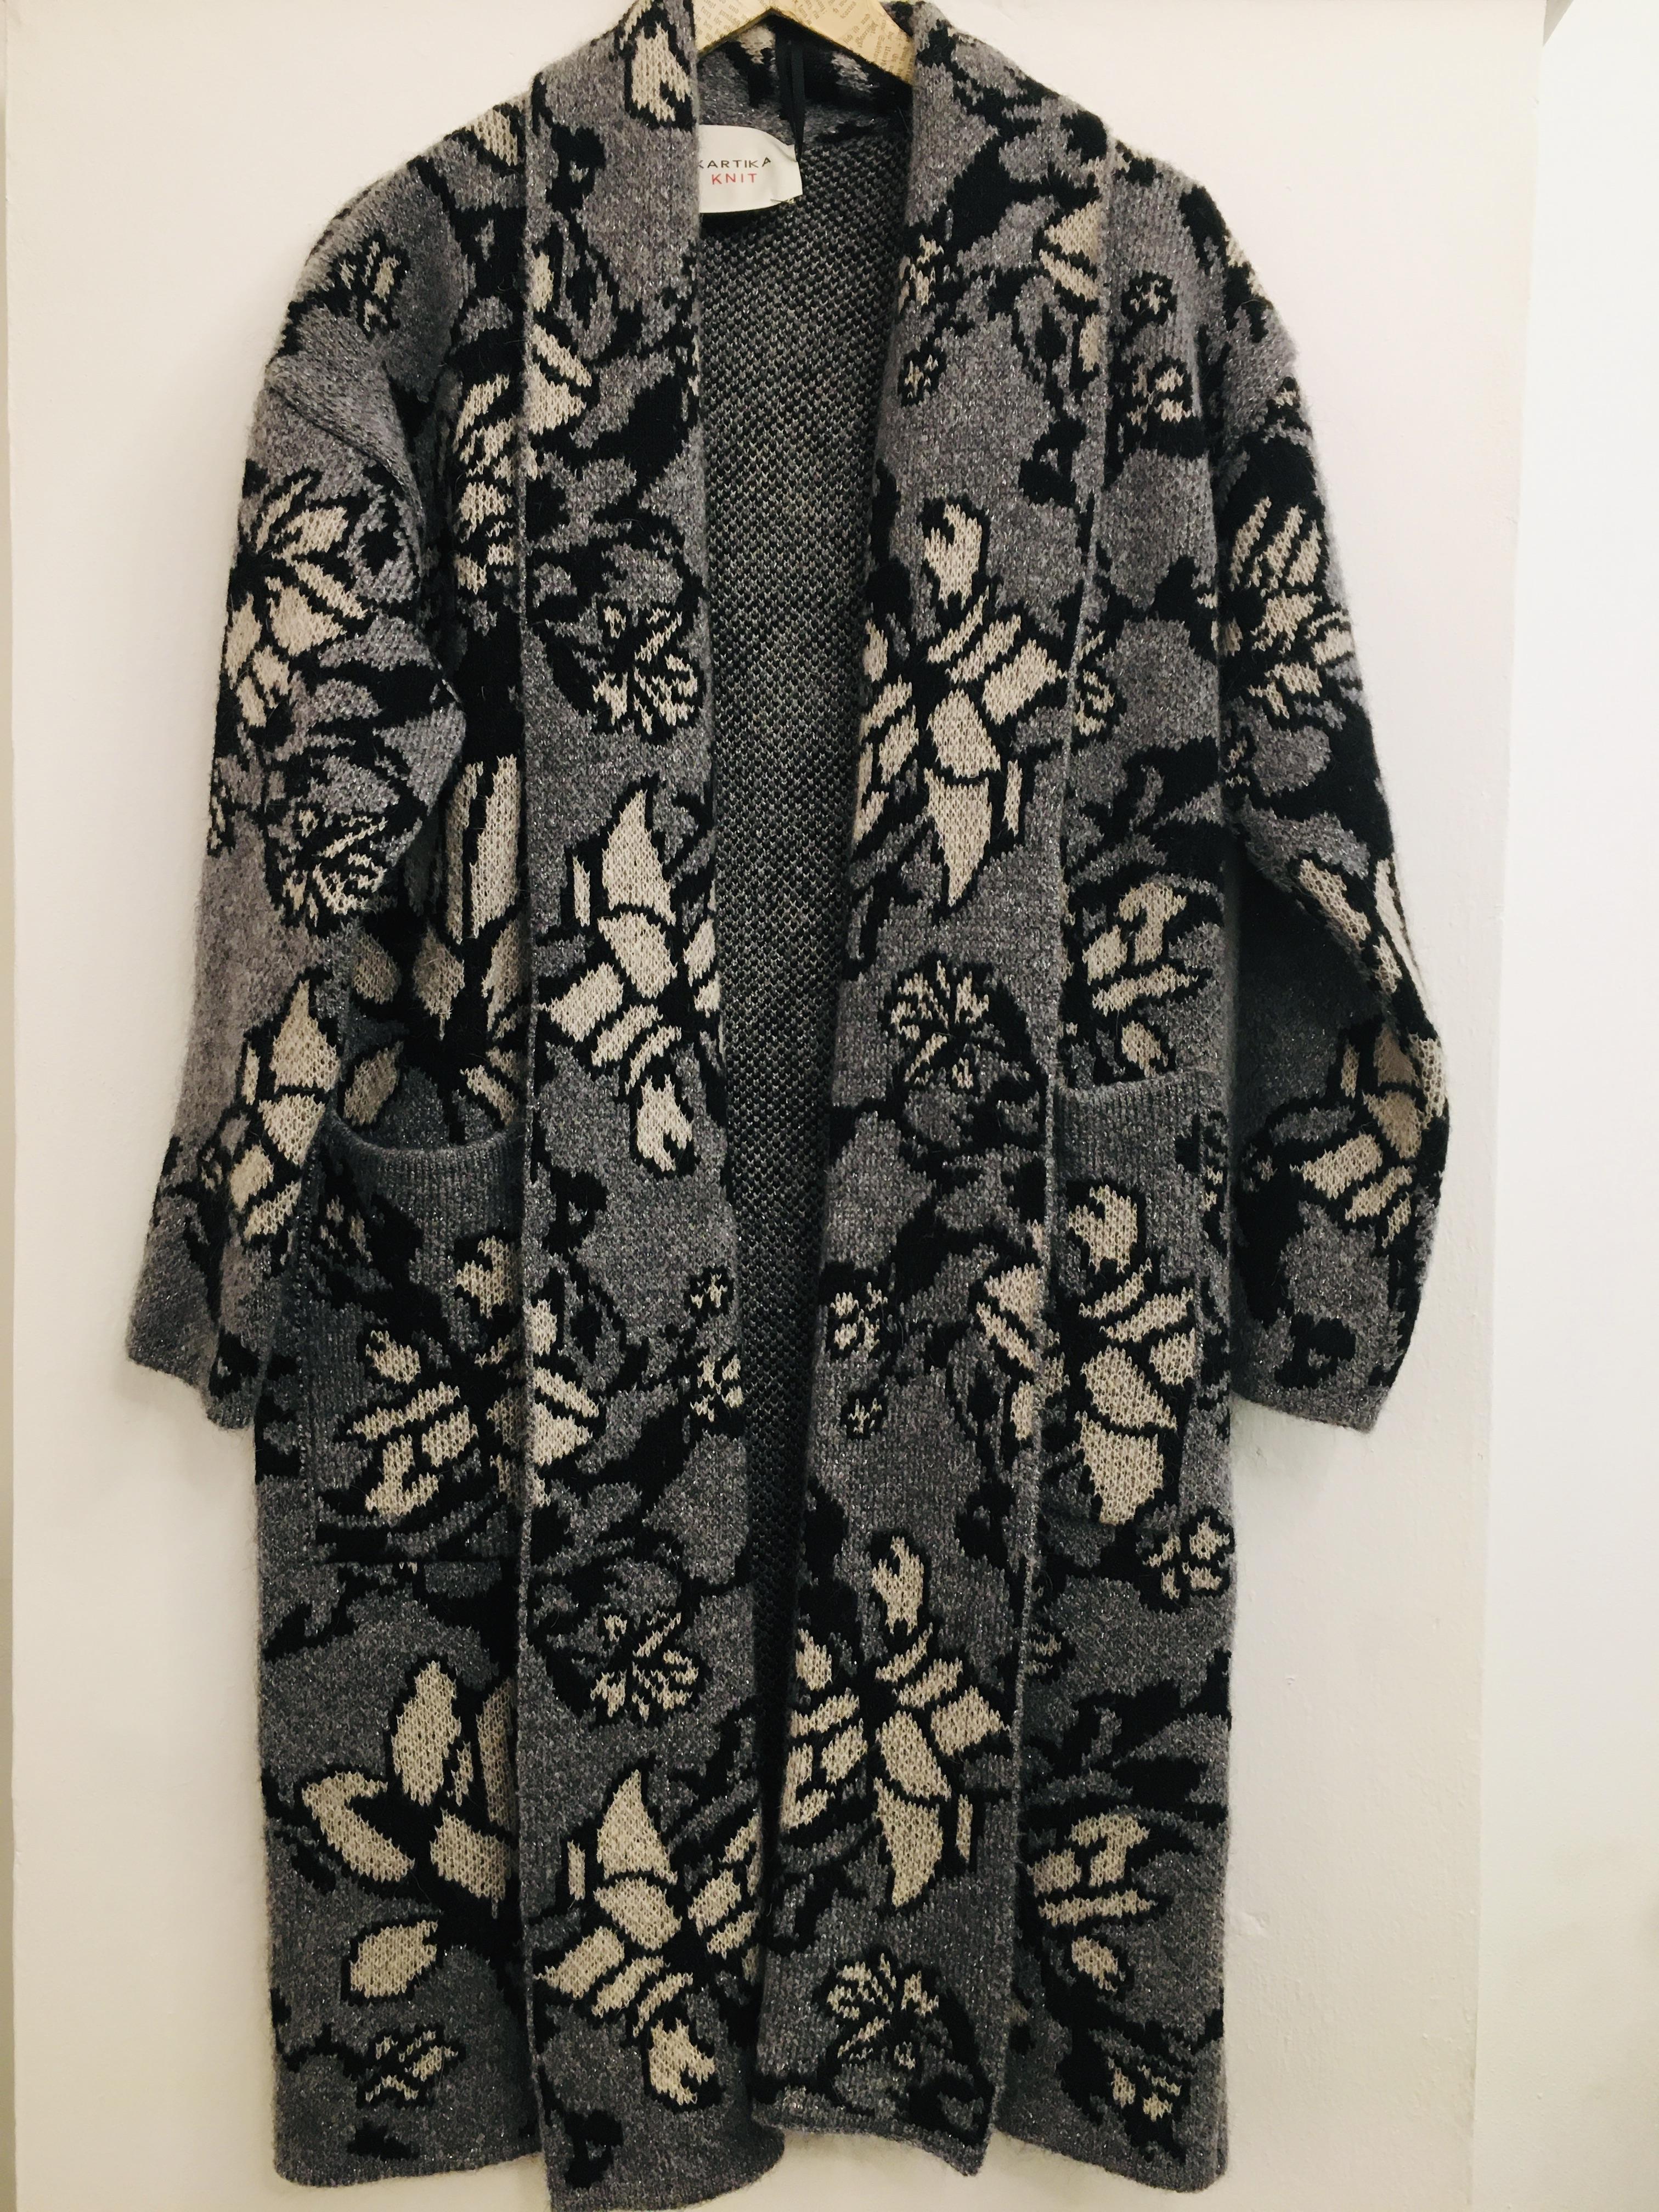 Cardigan donna| cardigan lungo| in lana| motivo floreale| manica lunga| made in Italy